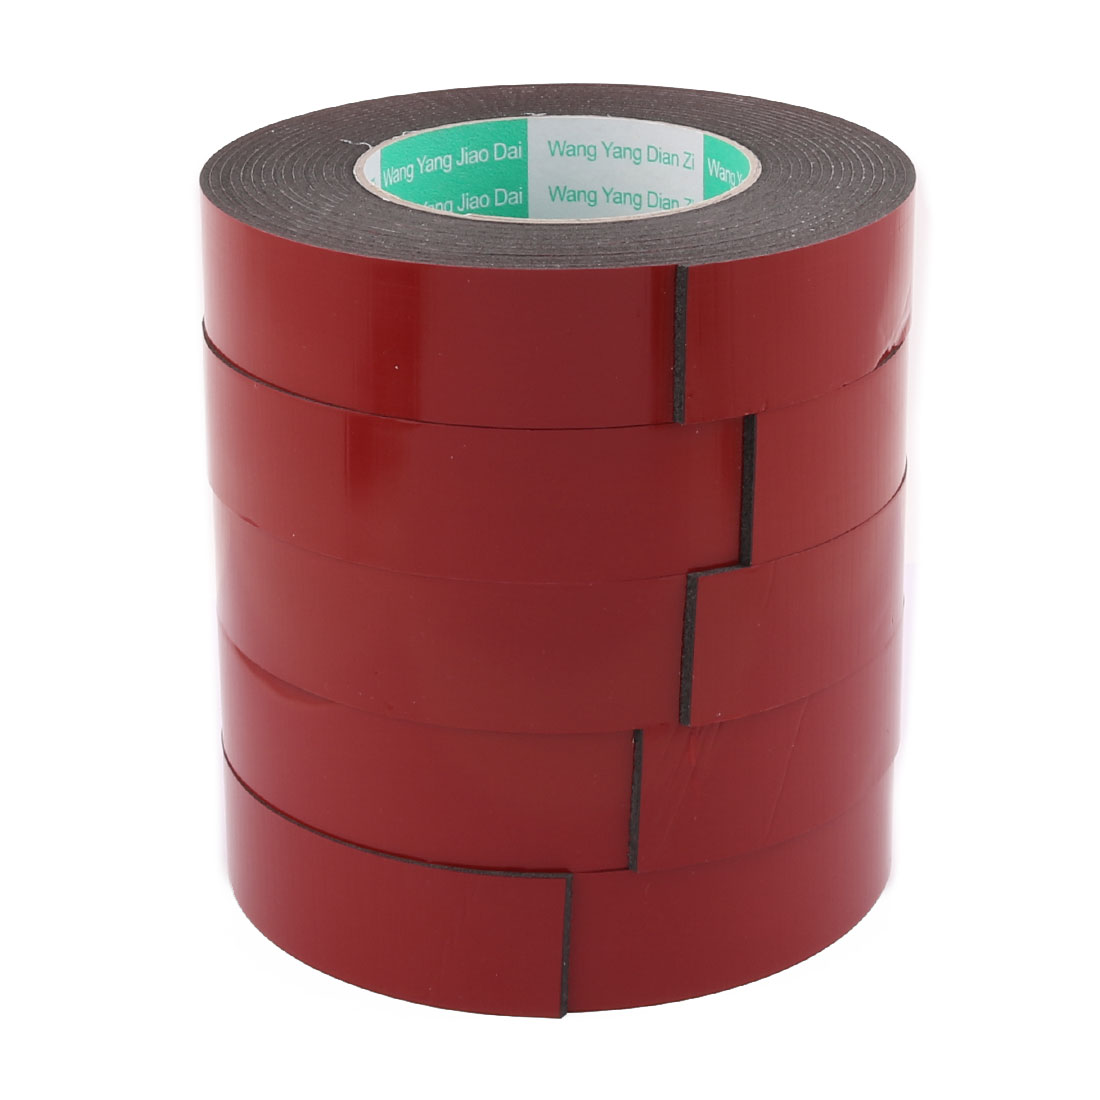 5Pcs 30mmx2mm Double Sided Sponge Tape Adhesive Sticker Foam Glue Strip Sealing 5 Meters